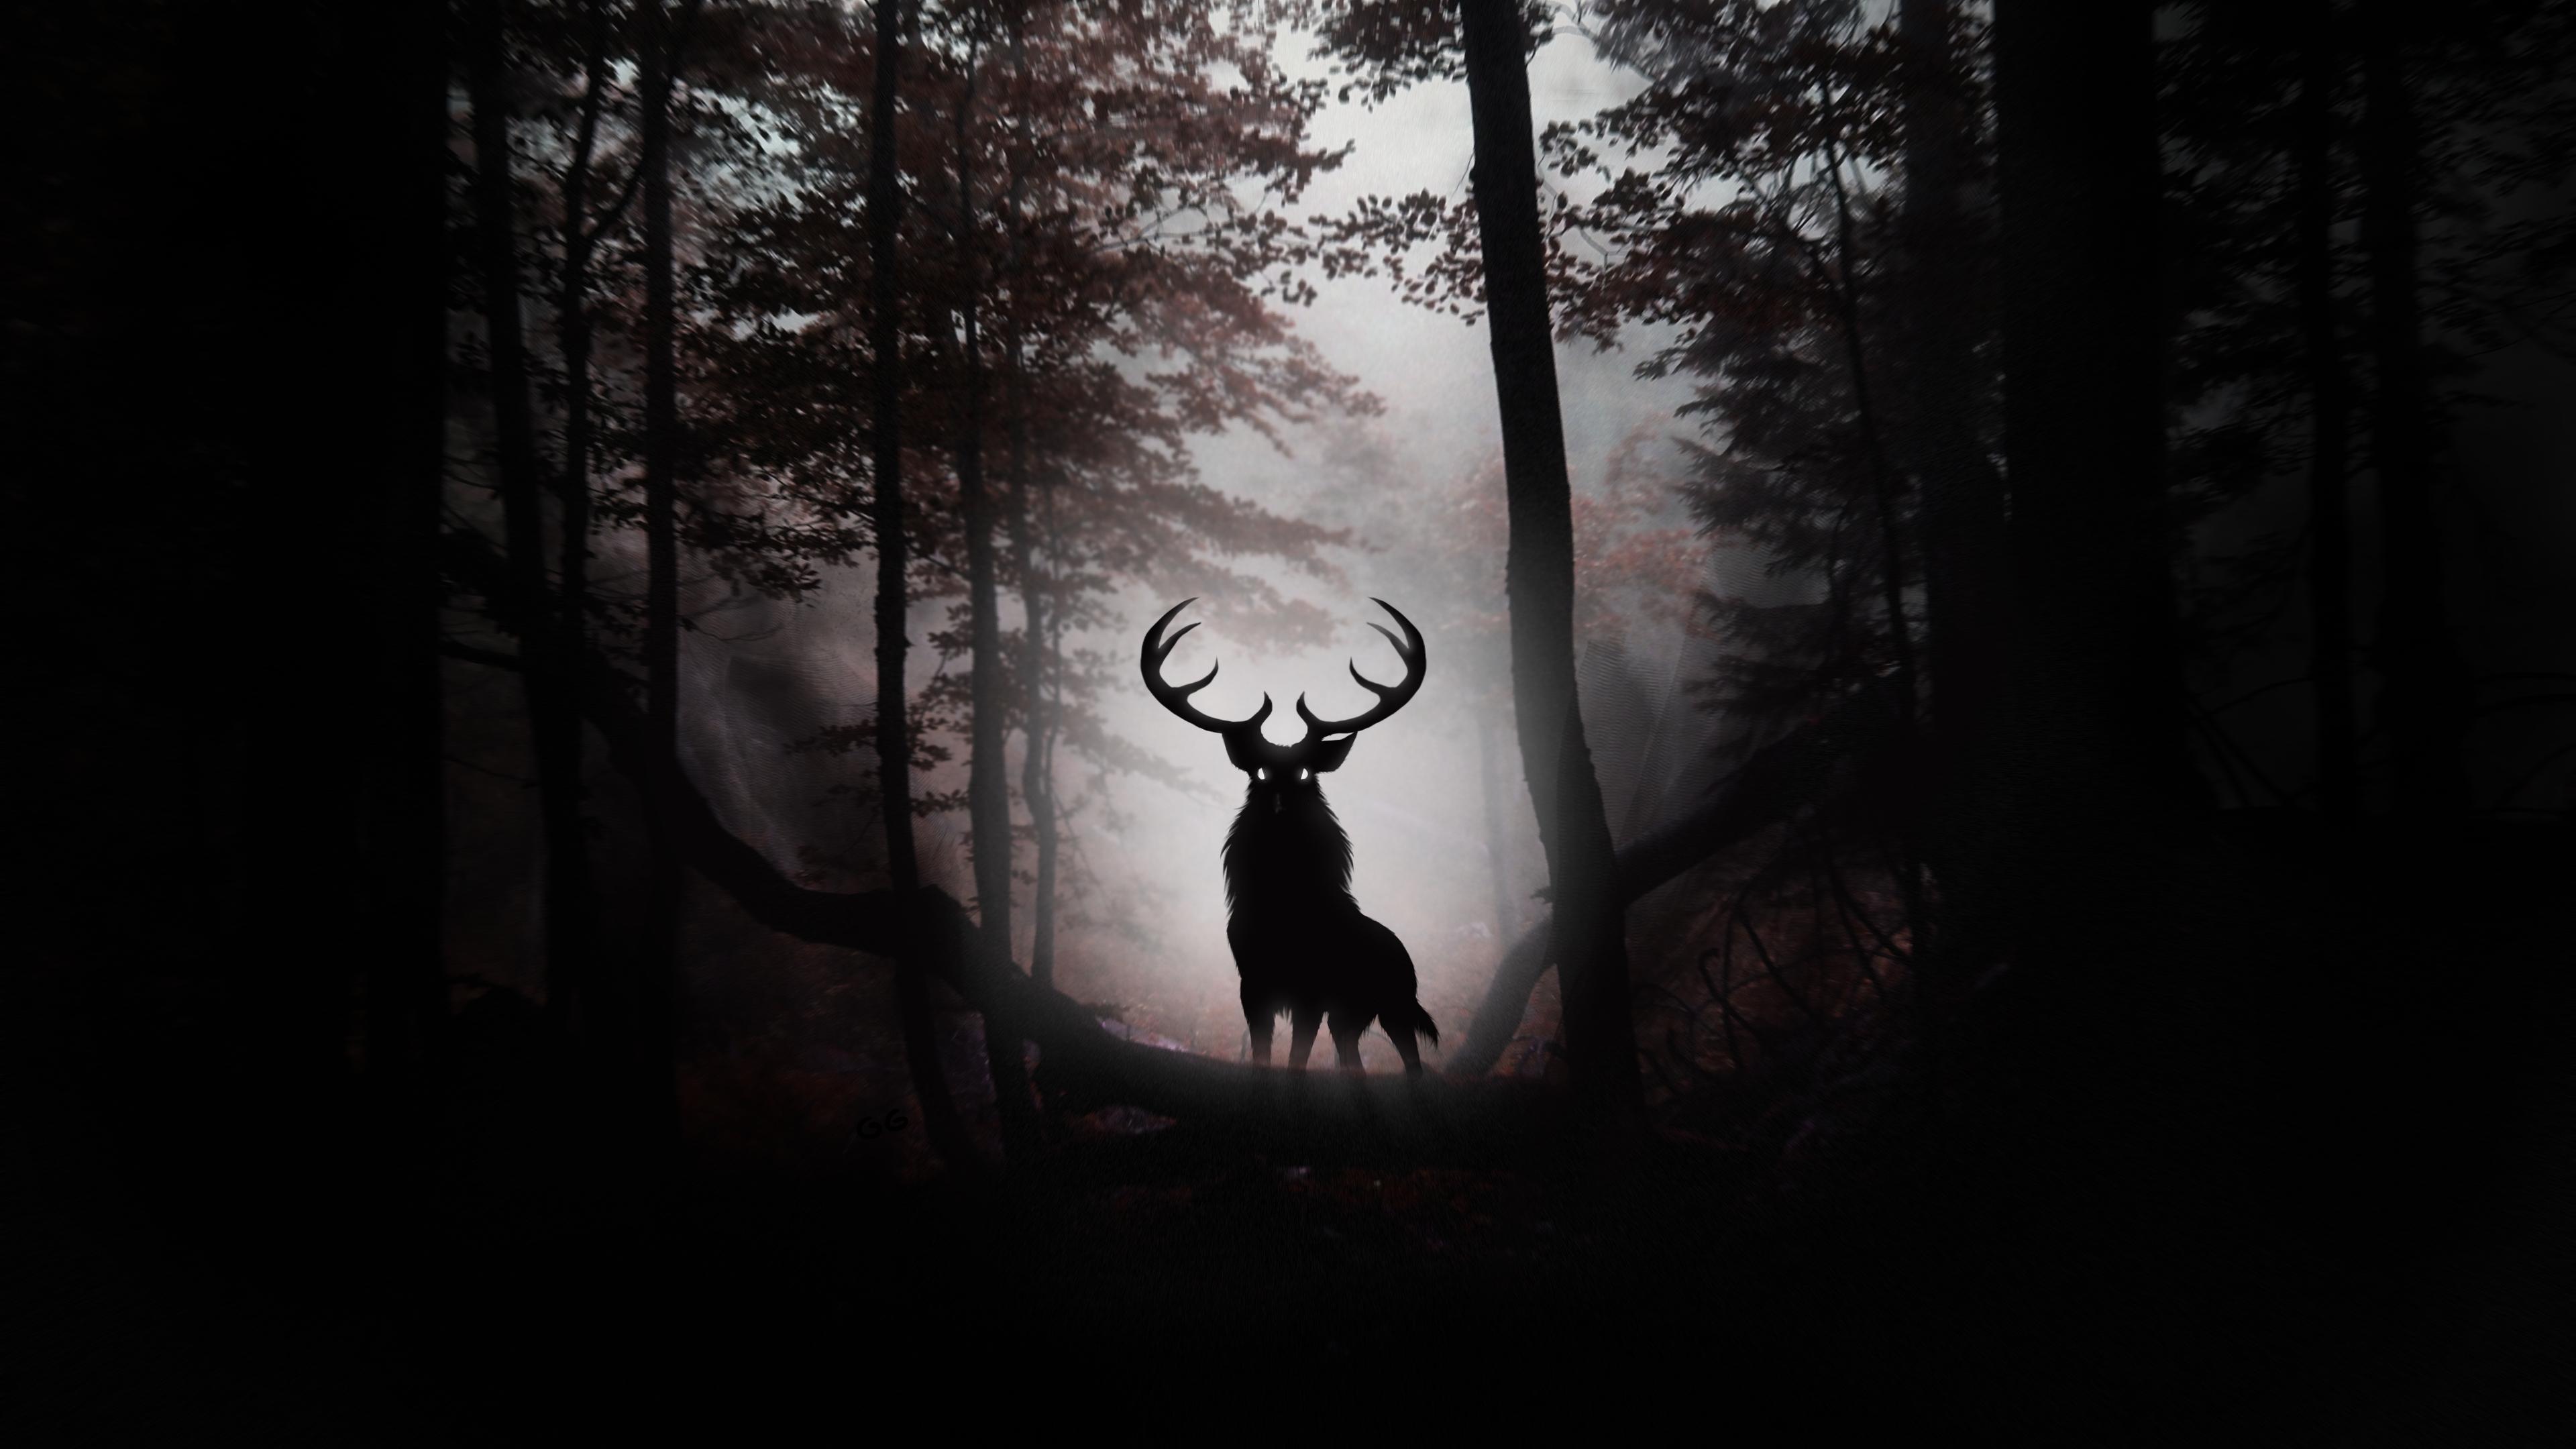 deer fantasy artwork 4k 1540748888 - Deer Fantasy Artwork 4k - hd-wallpapers, forest wallpapers, digital art wallpapers, deer wallpapers, artist wallpapers, animals wallpapers, 4k-wallpapers